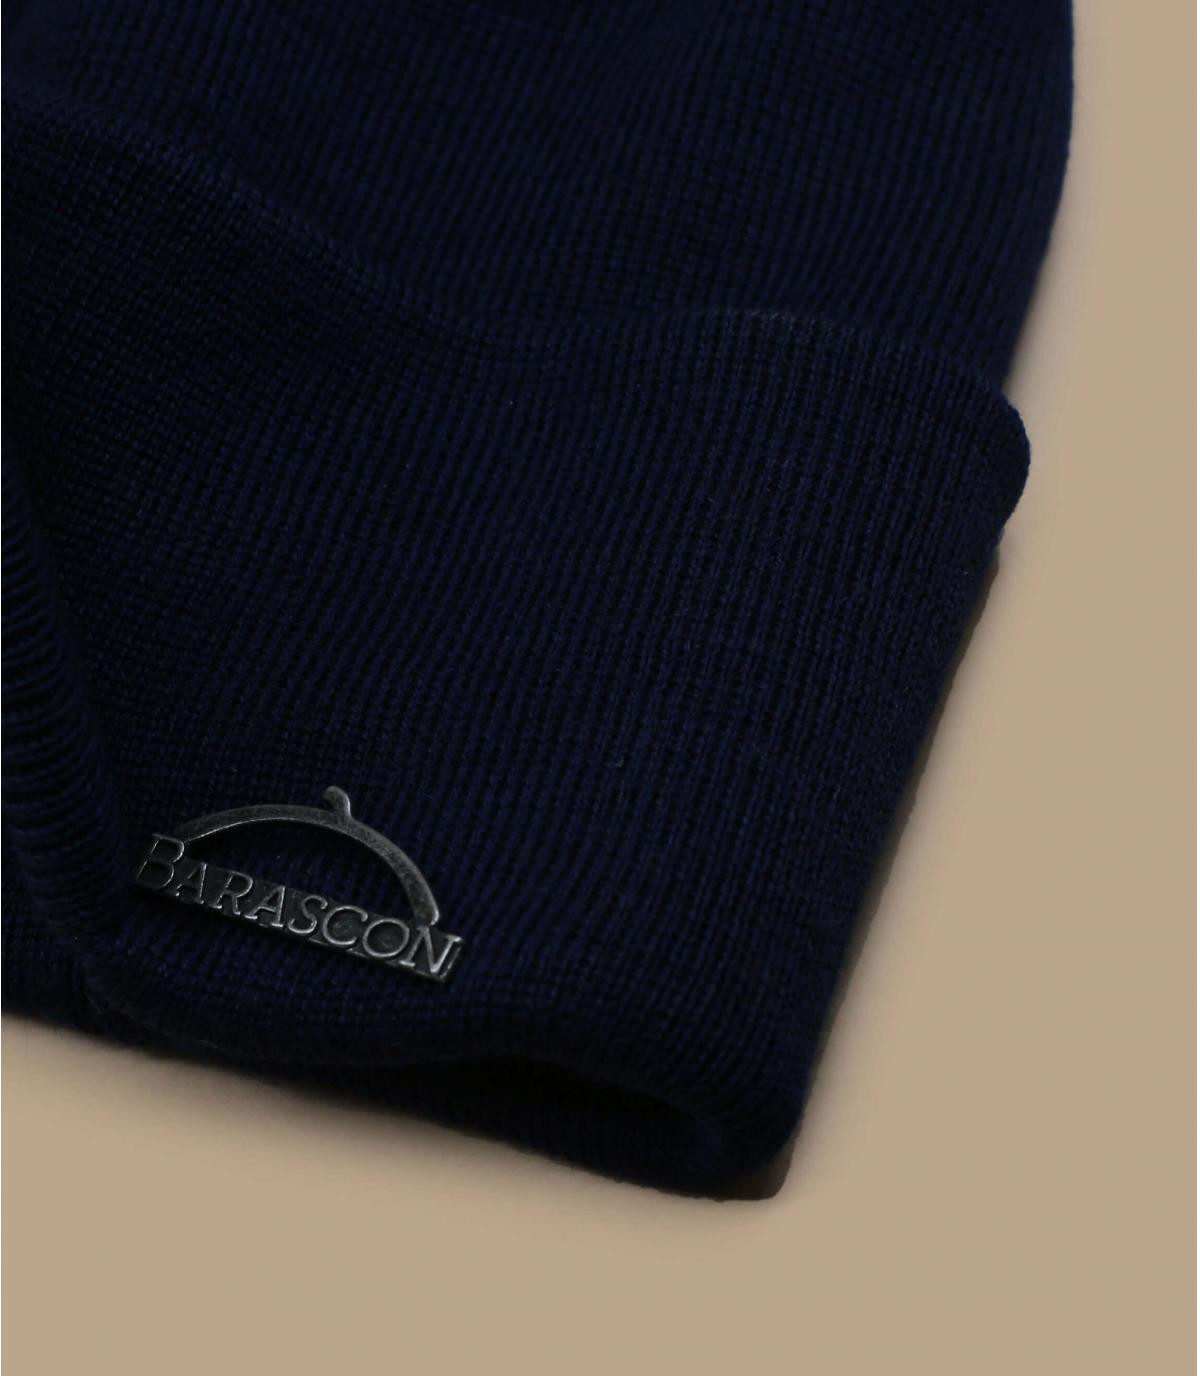 Details Barascon Beanie Wool Acryl navy - afbeeling 1